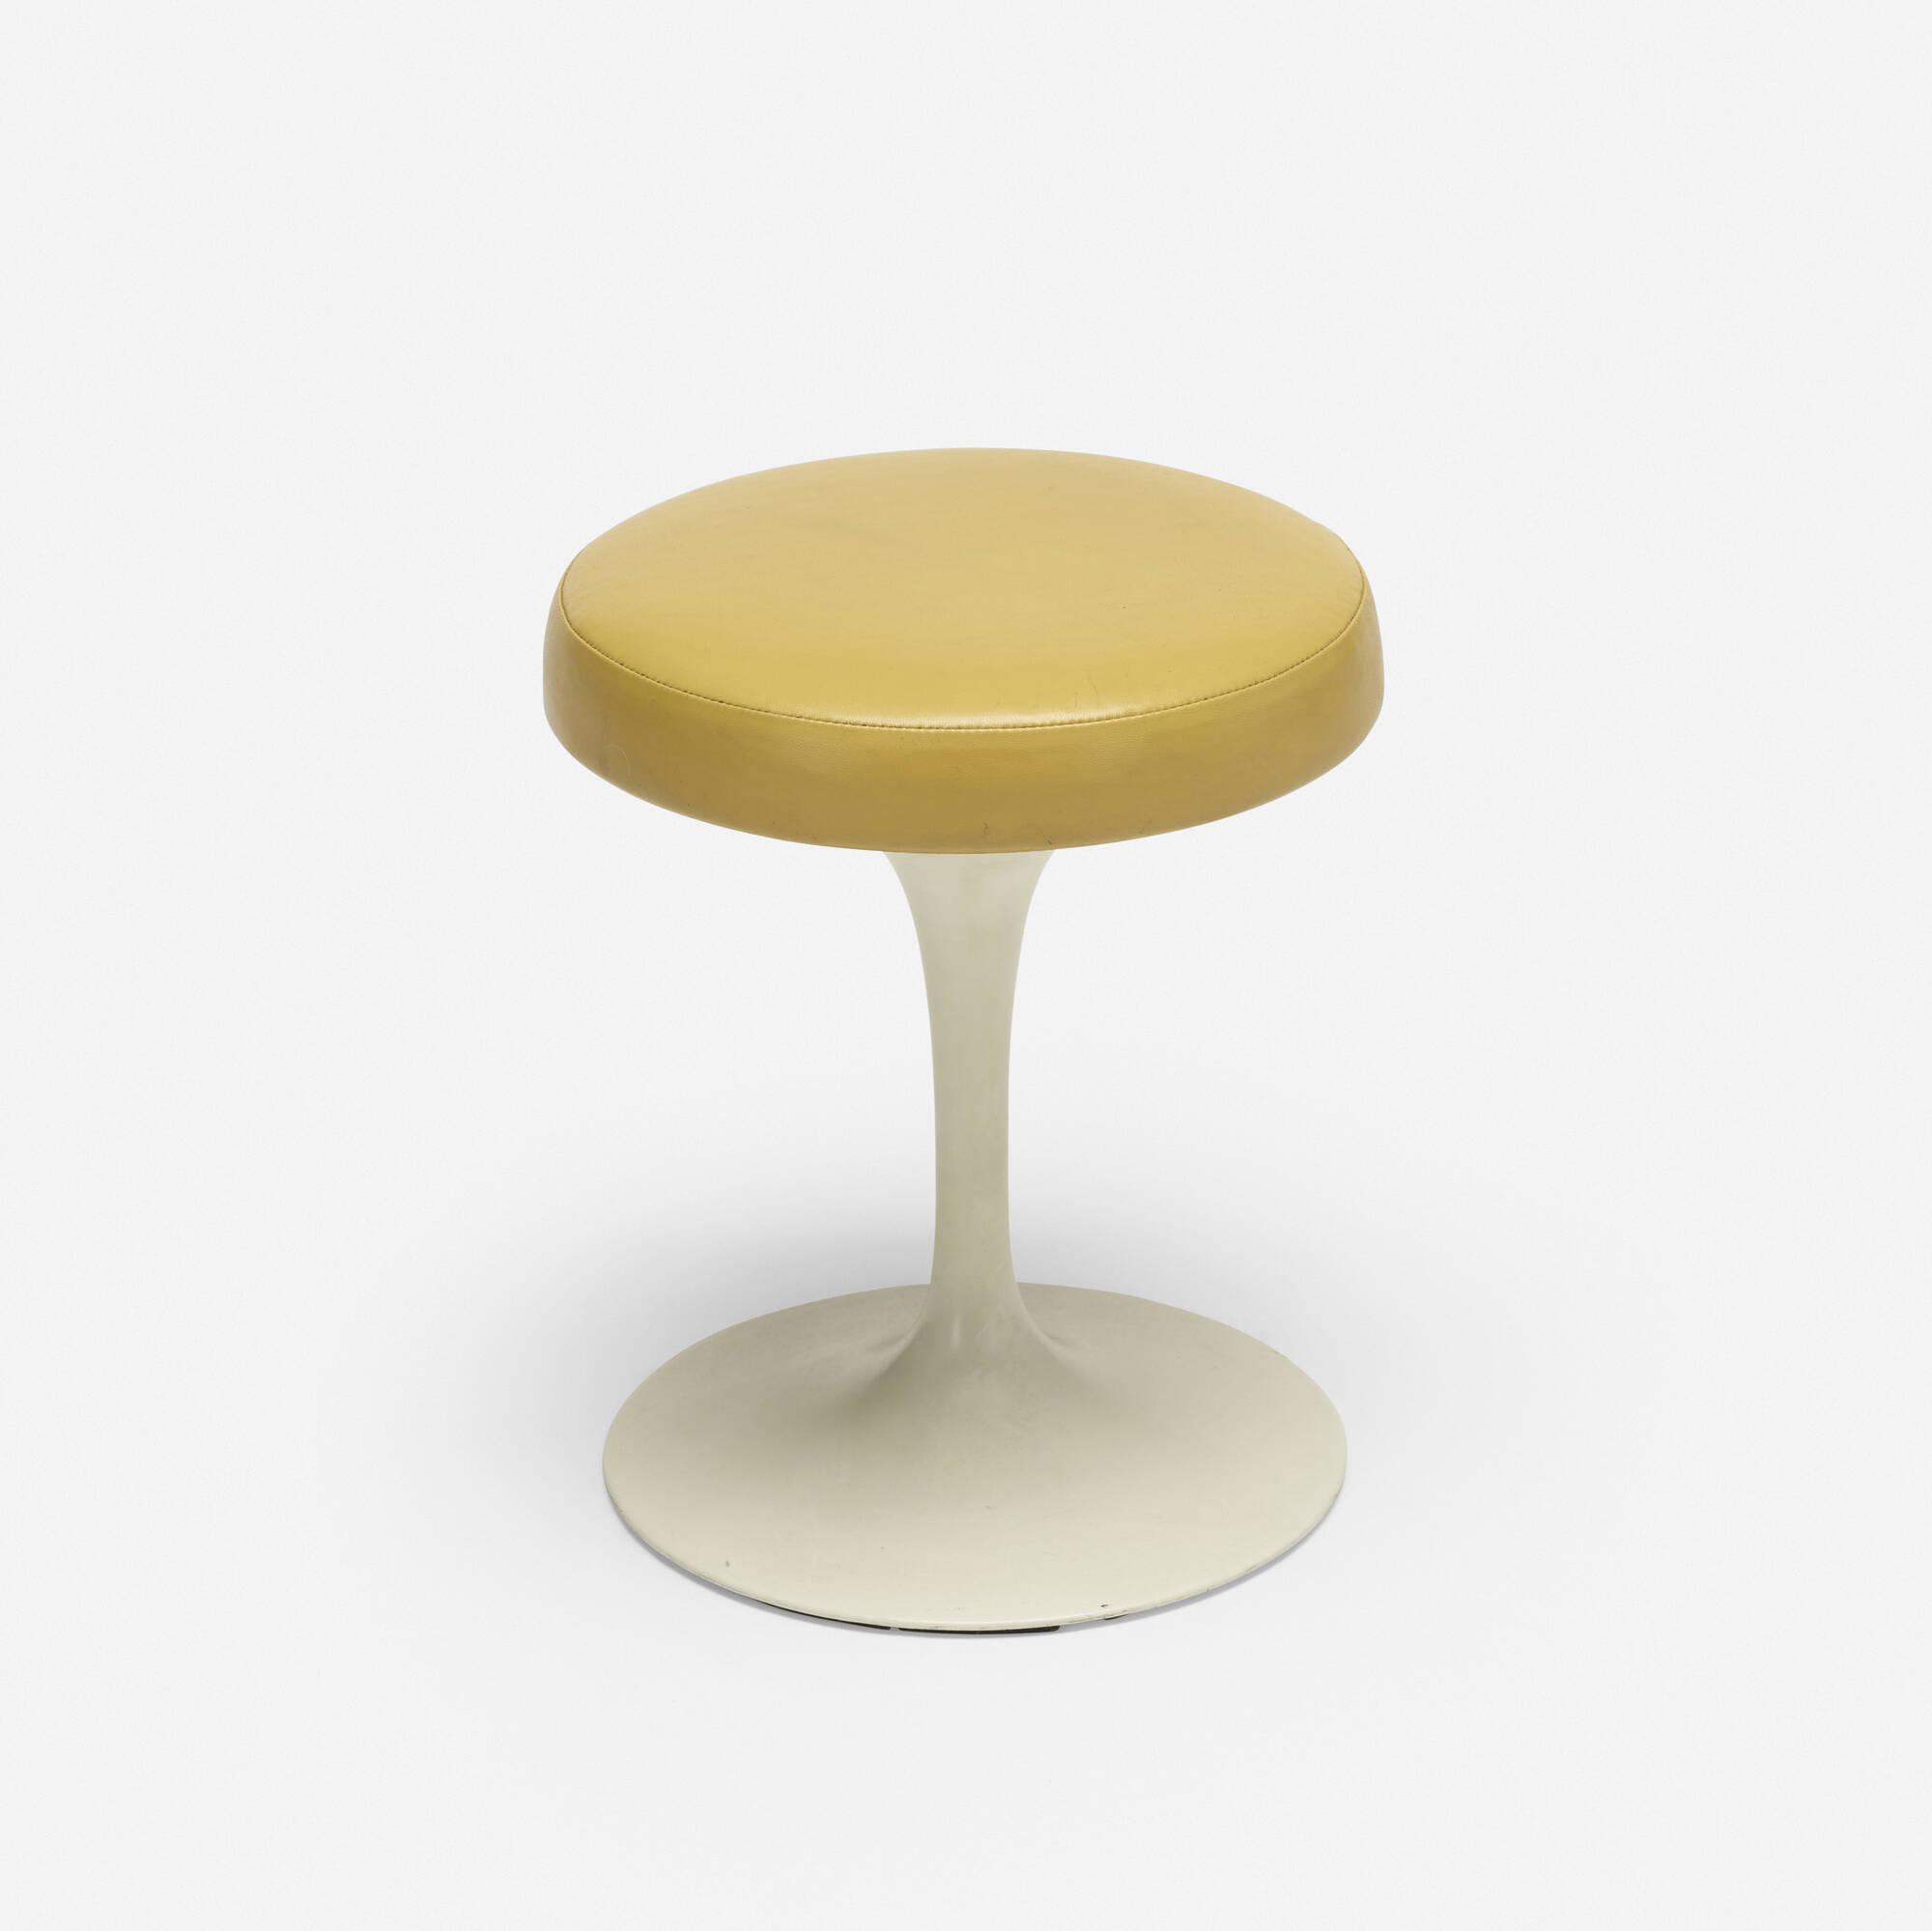 703: Eero Saarinen / Tulip stool (1 of 2)